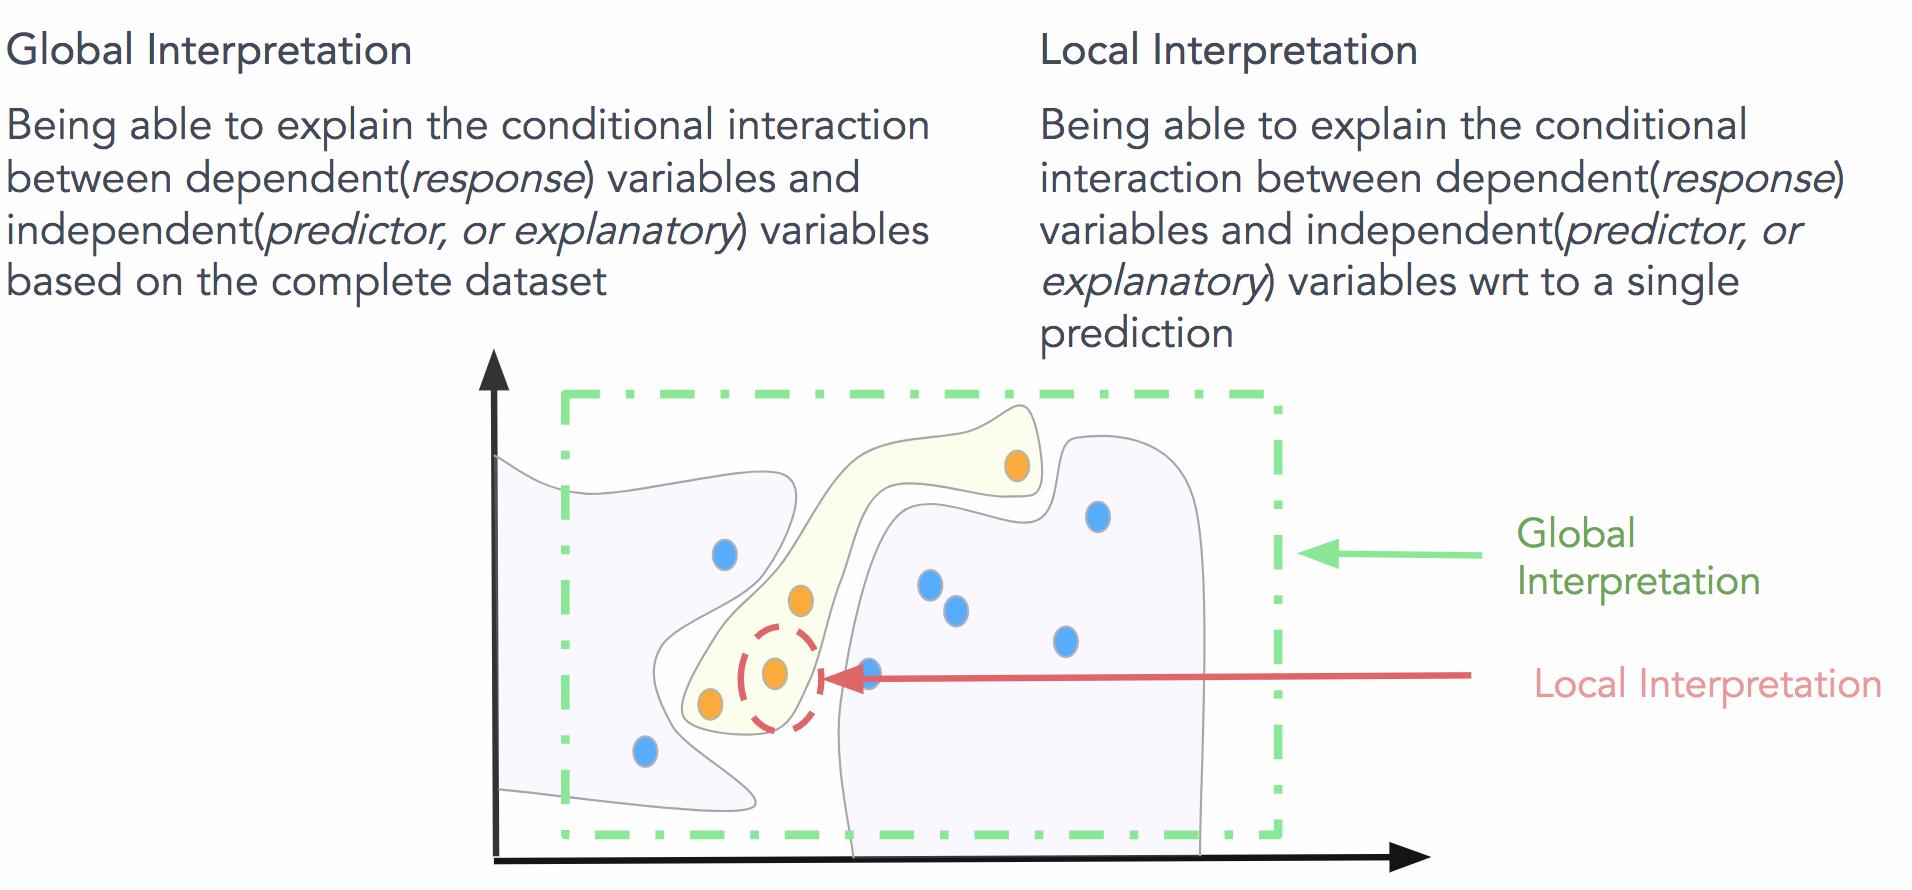 Summarizing global and local interpretation